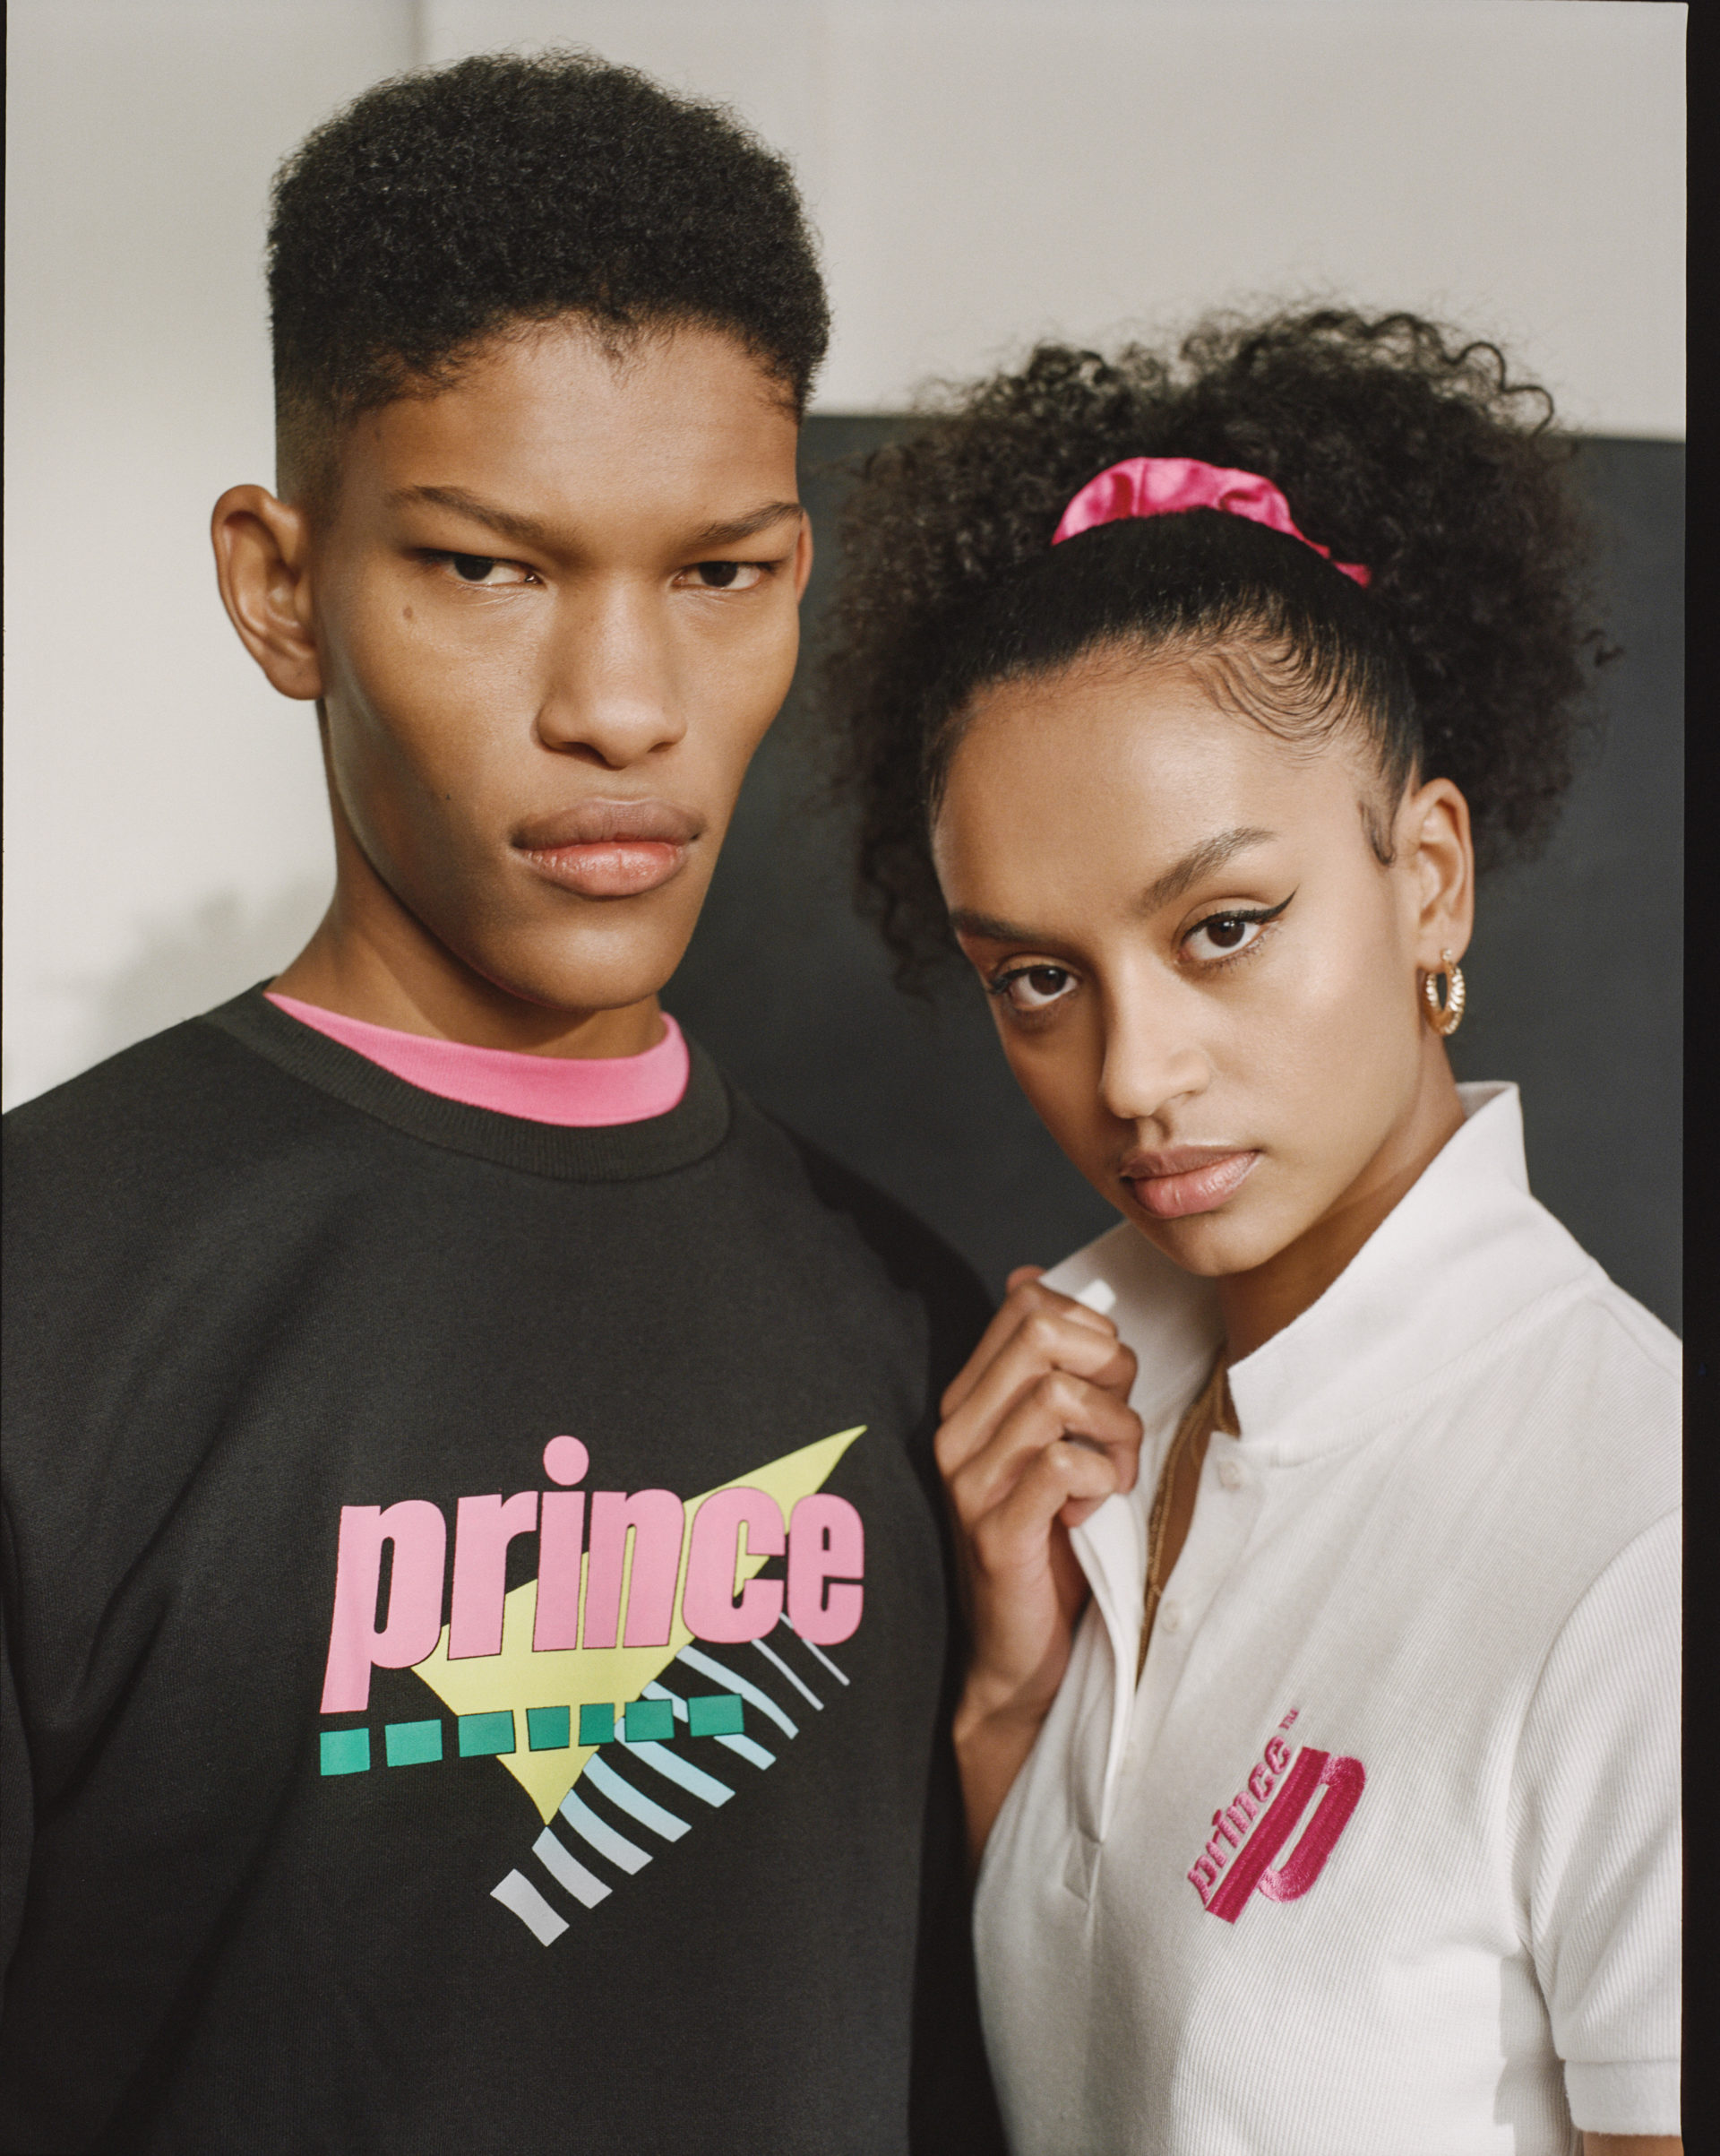 X PRINCE | PRIMARK